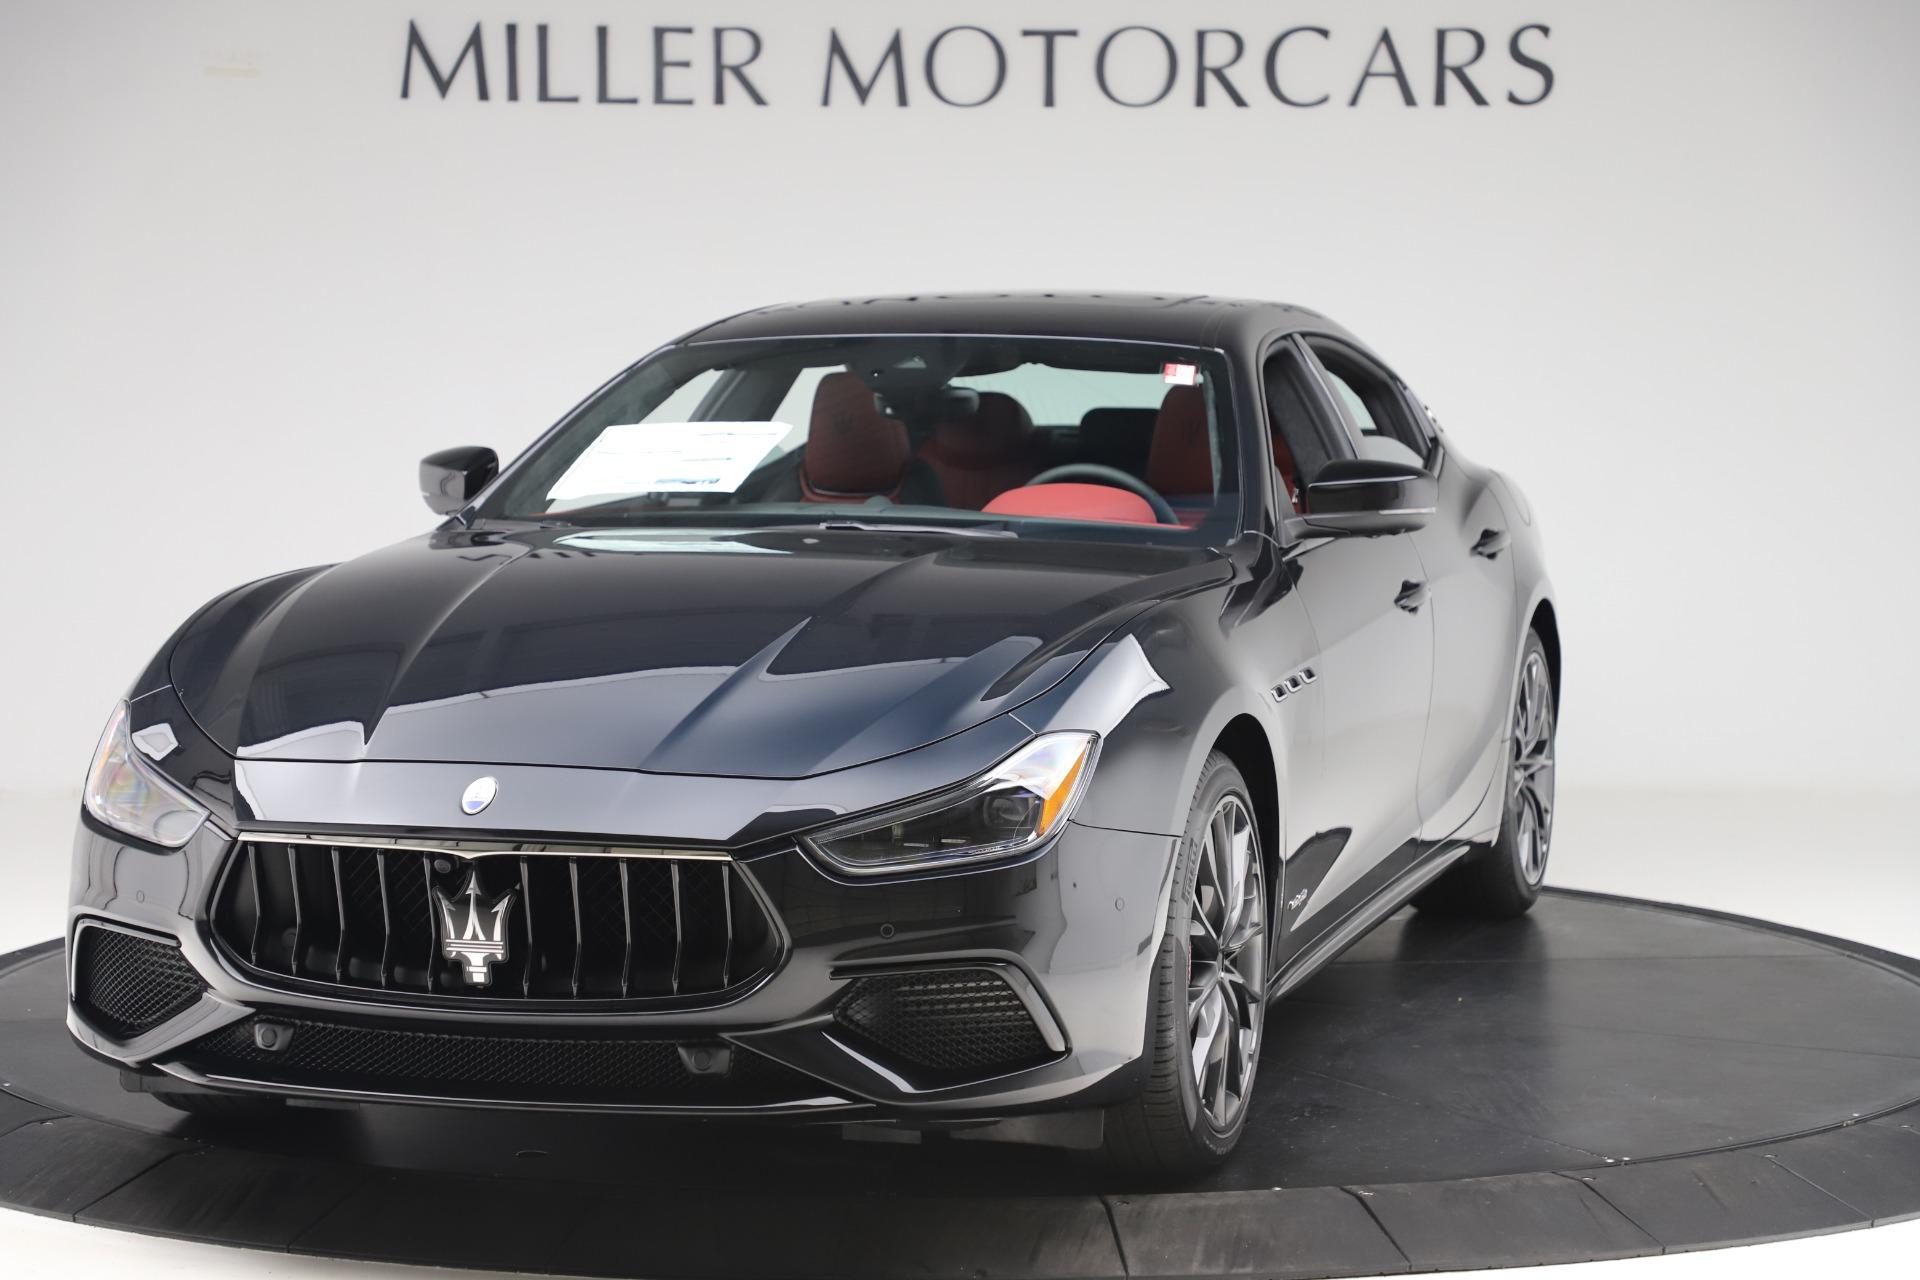 New 2020 Maserati Ghibli S Q4 GranSport for sale Sold at Maserati of Greenwich in Greenwich CT 06830 1